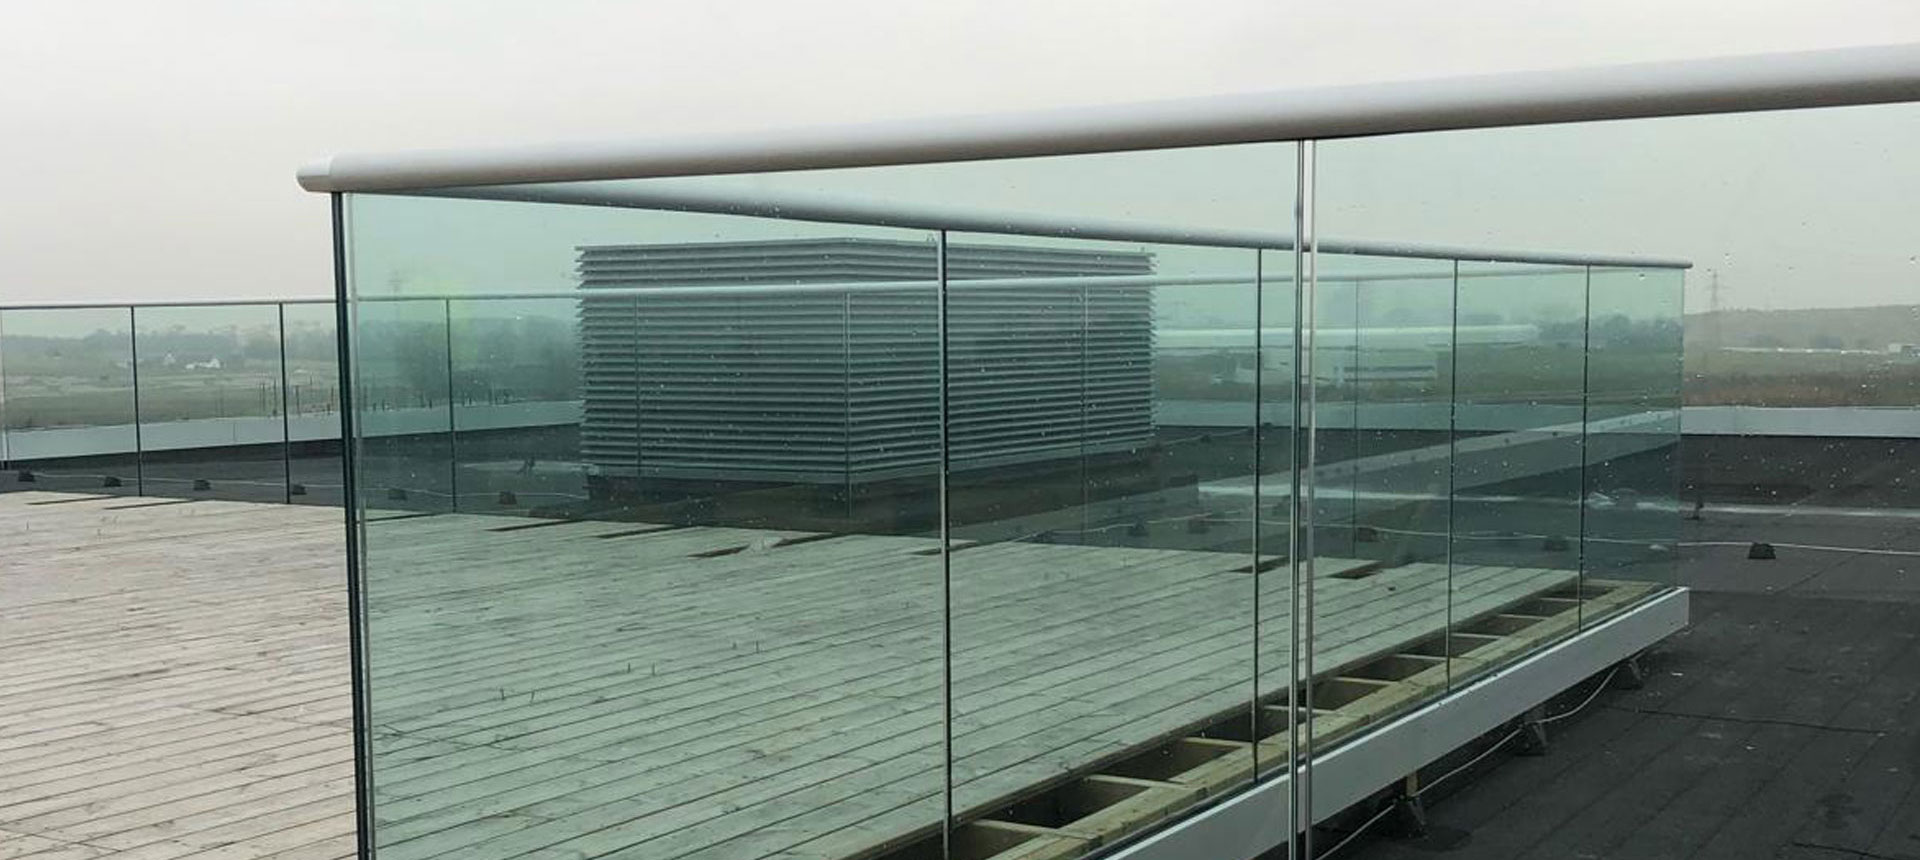 bv9900 rooftop mount